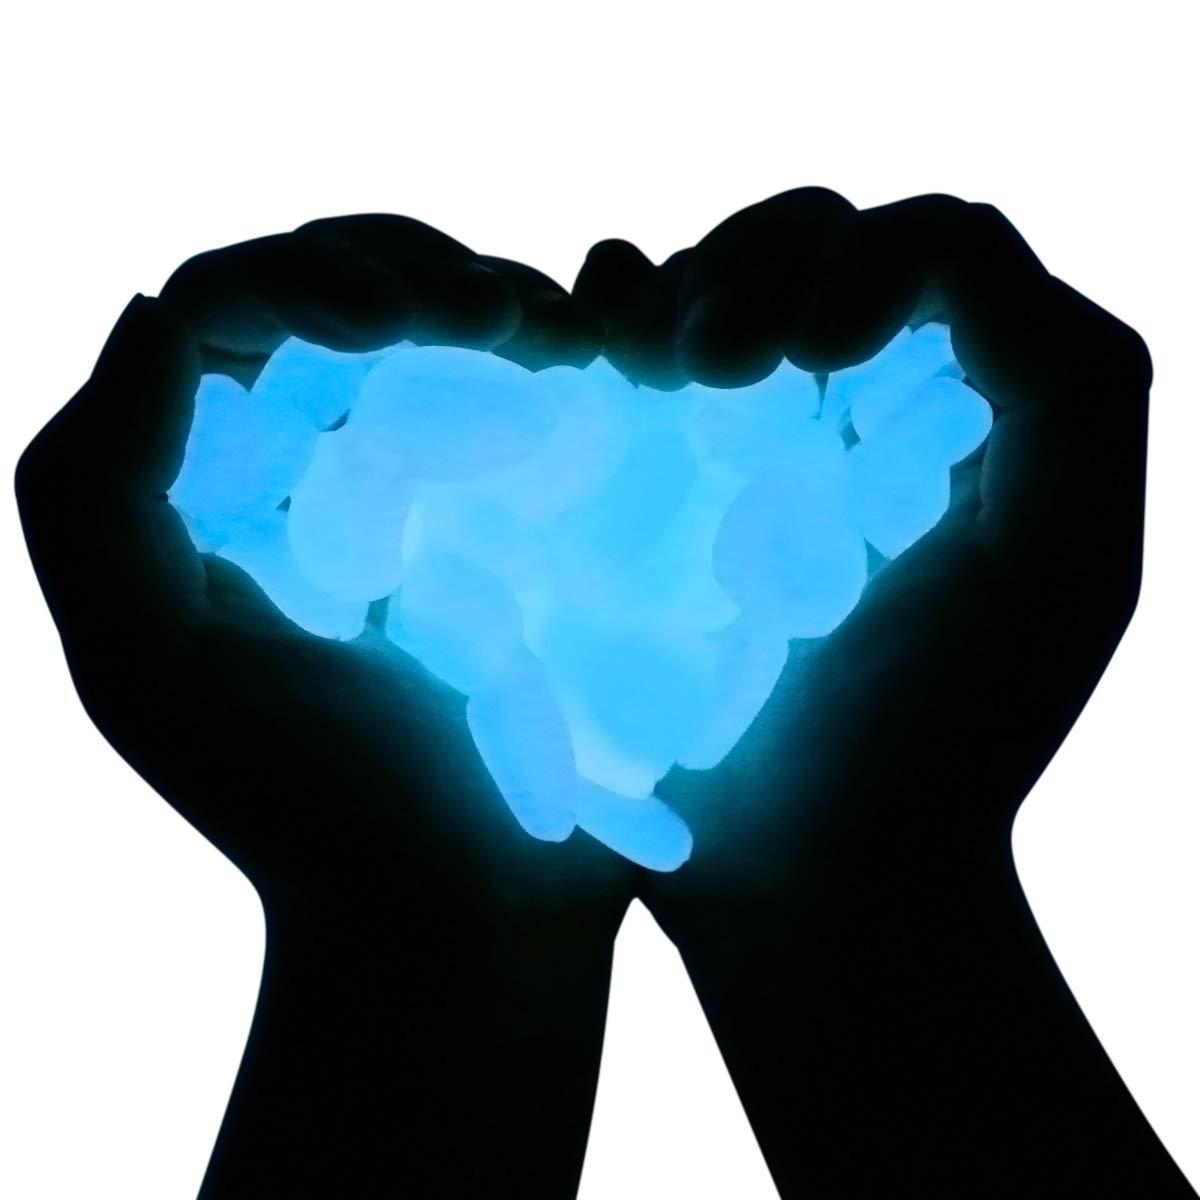 MEYUEWAL Glow in The Dark Pebbles 200PCS Glow Stones Luminous Pebbles for Walkways, Path, Gardens, Lawns, Driveways, Plants, Fish Tank, Aquarium (Blue)